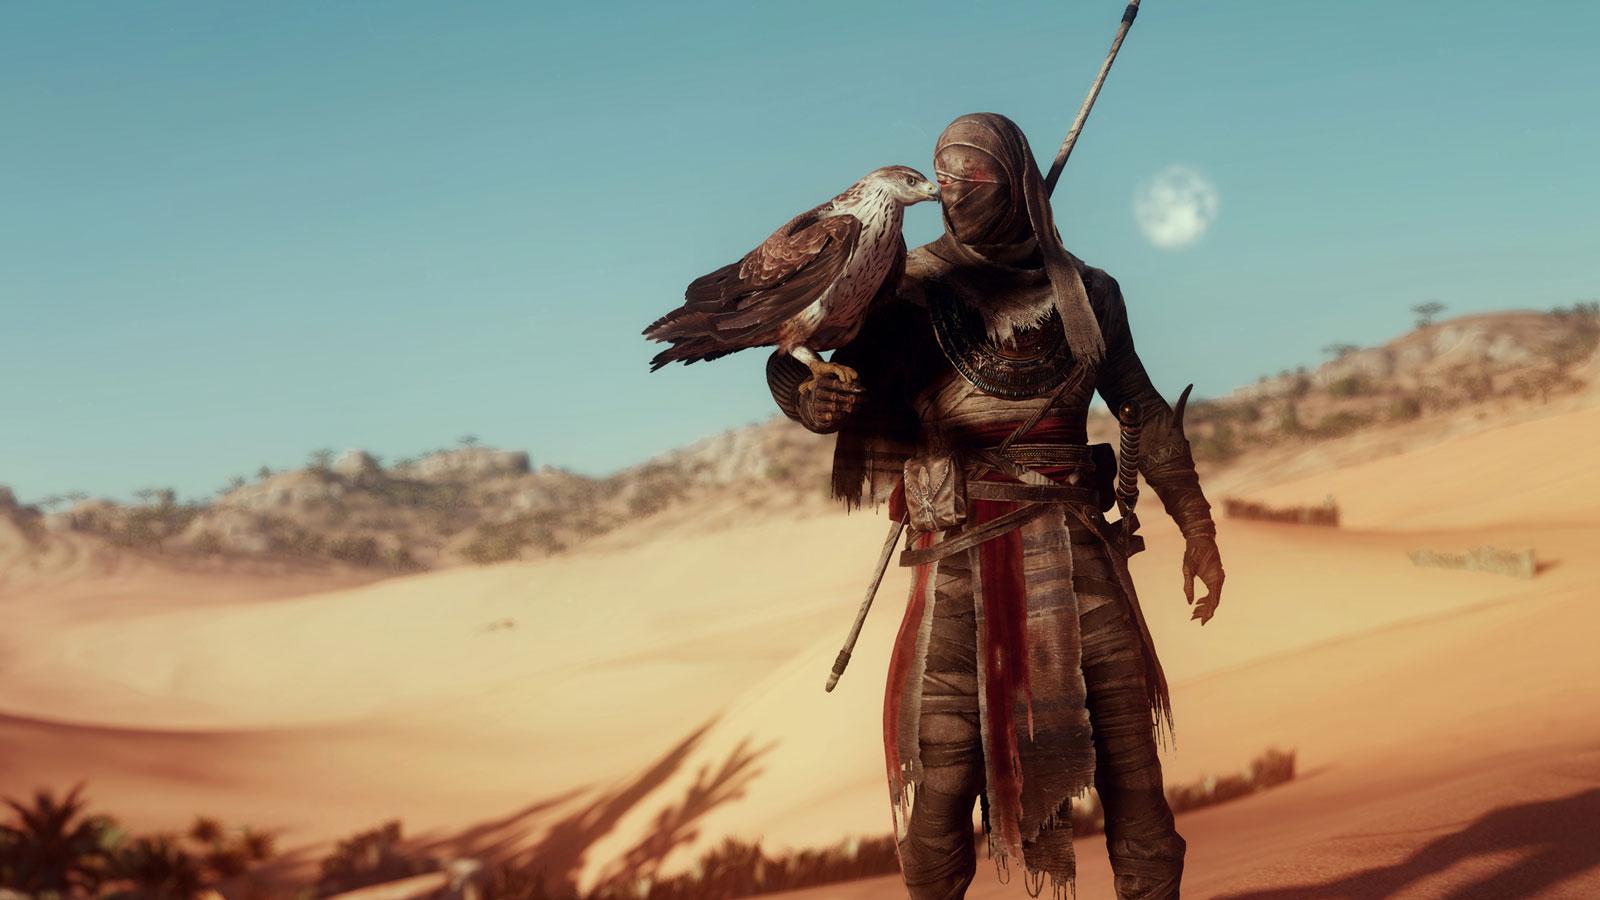 Free Assassin's Creed Origins Wallpaper in 1600x900